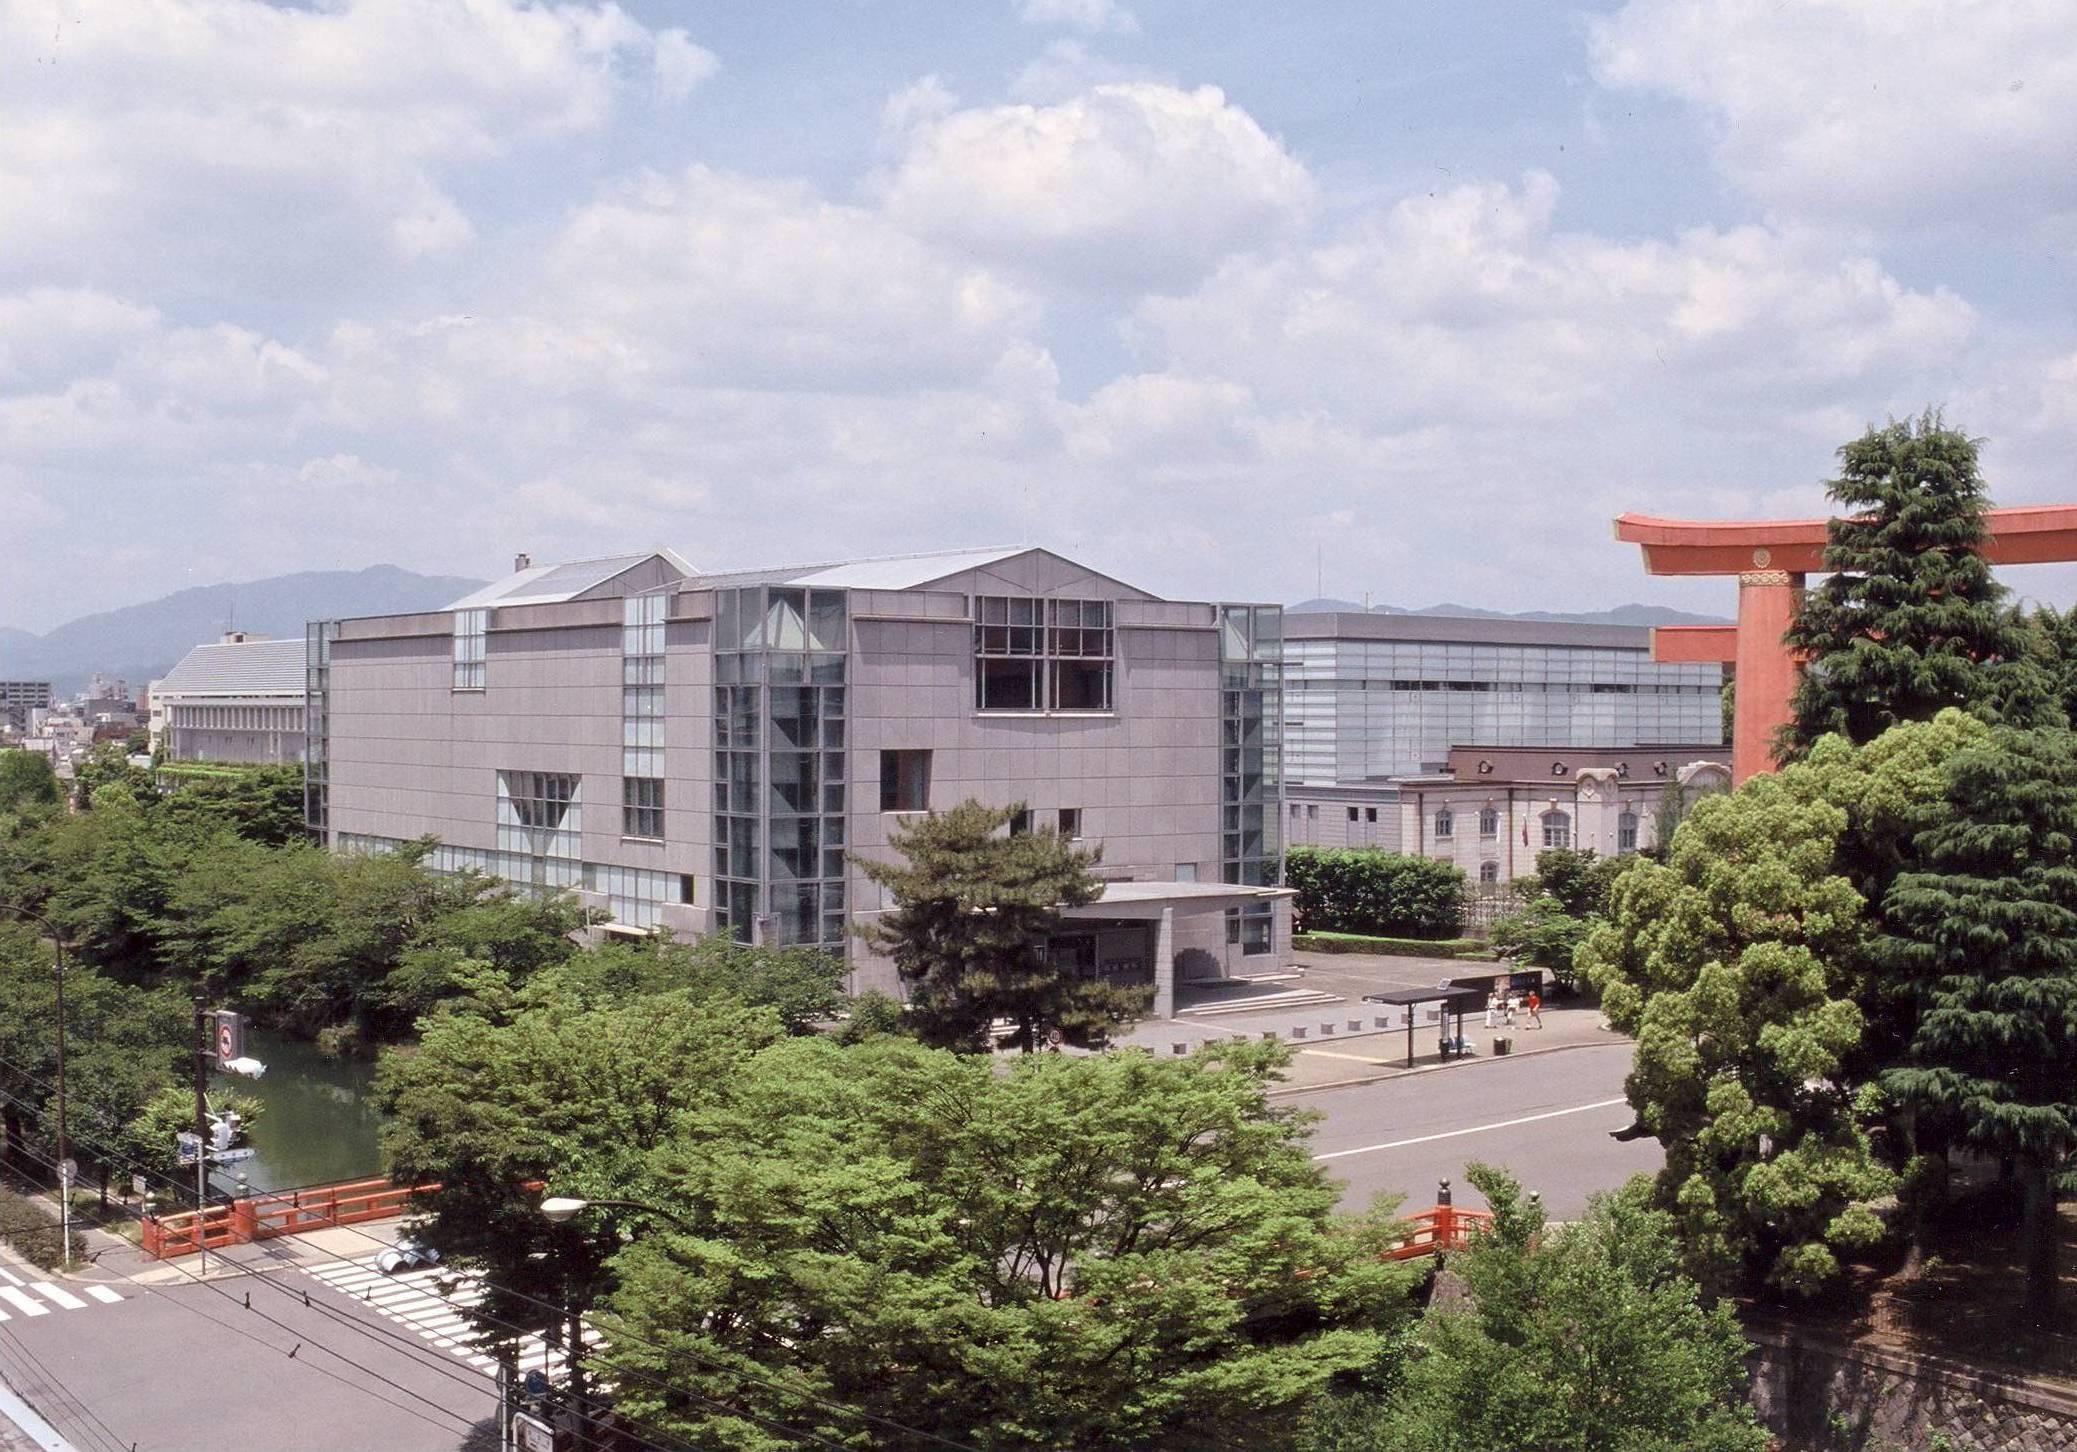 京都国立近代美術館 | 京都で遊ぼうART ~京都地域の美術館、展覧会 ...